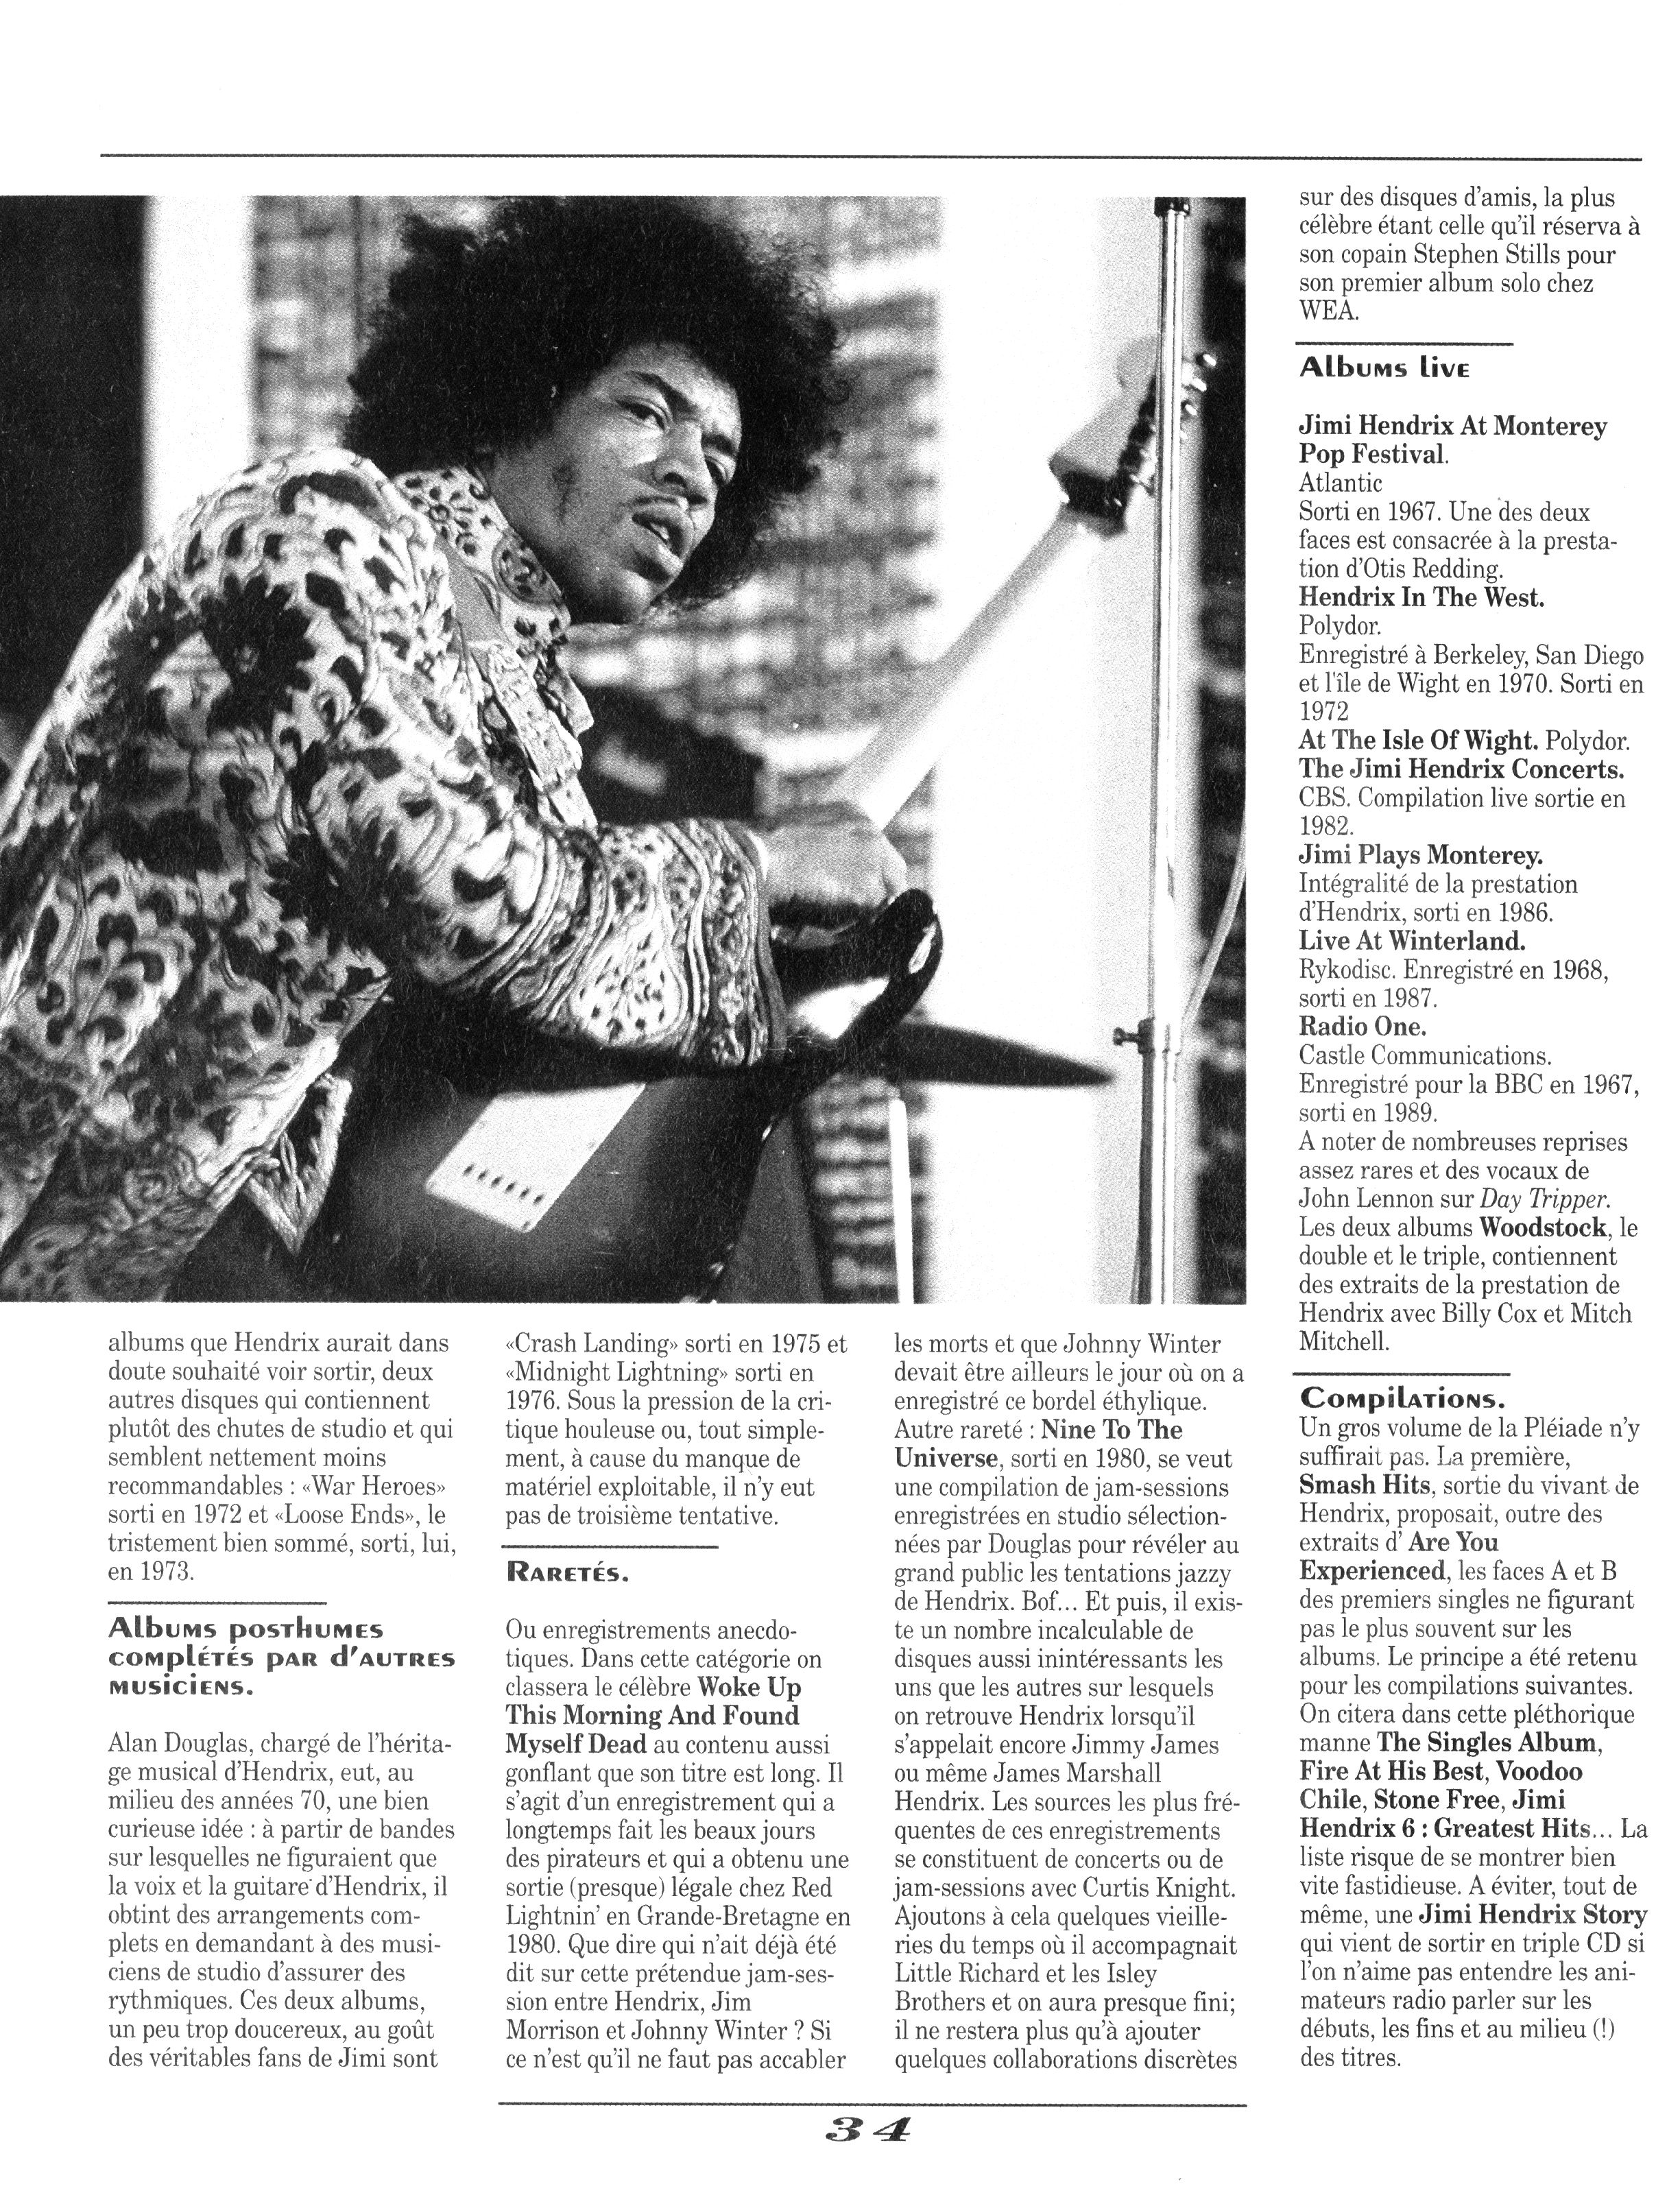 Magazines Français 1989 - 2014 GuitarWorldAvrilMaiJuin1990Page34